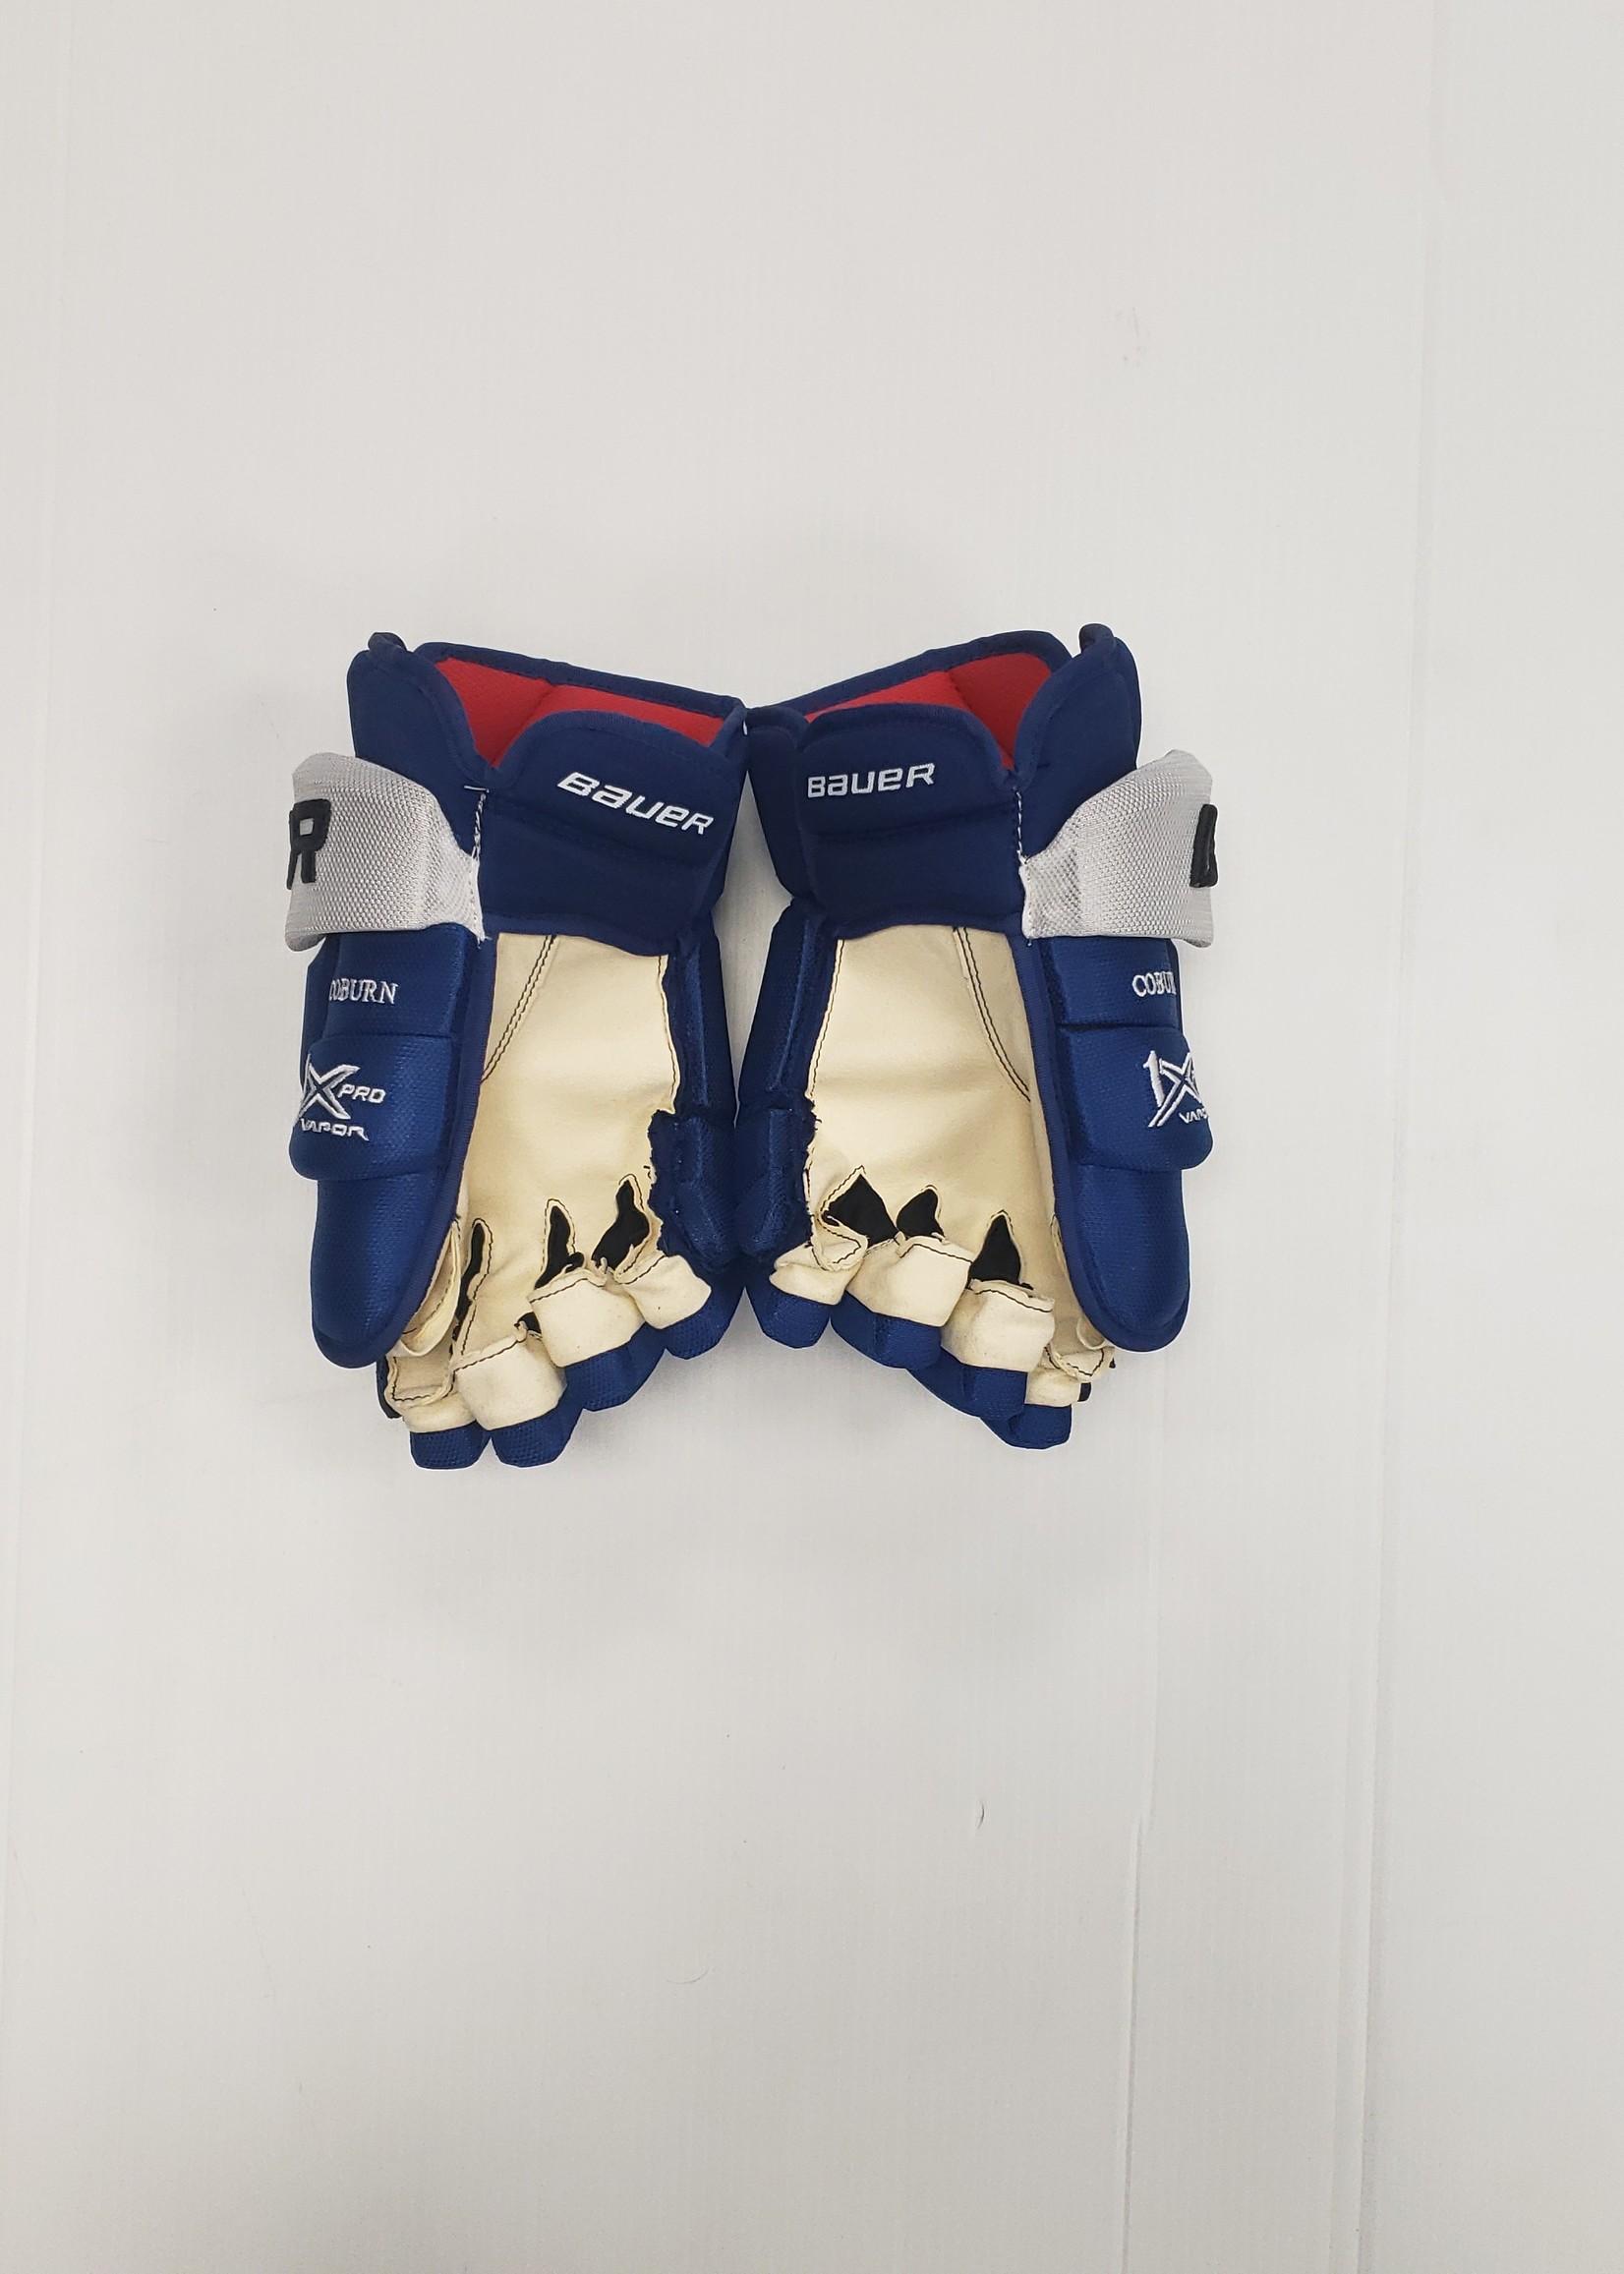 Bauer Vapor 1X Pro Lightning Pro Stock Hockey Gloves Coburn